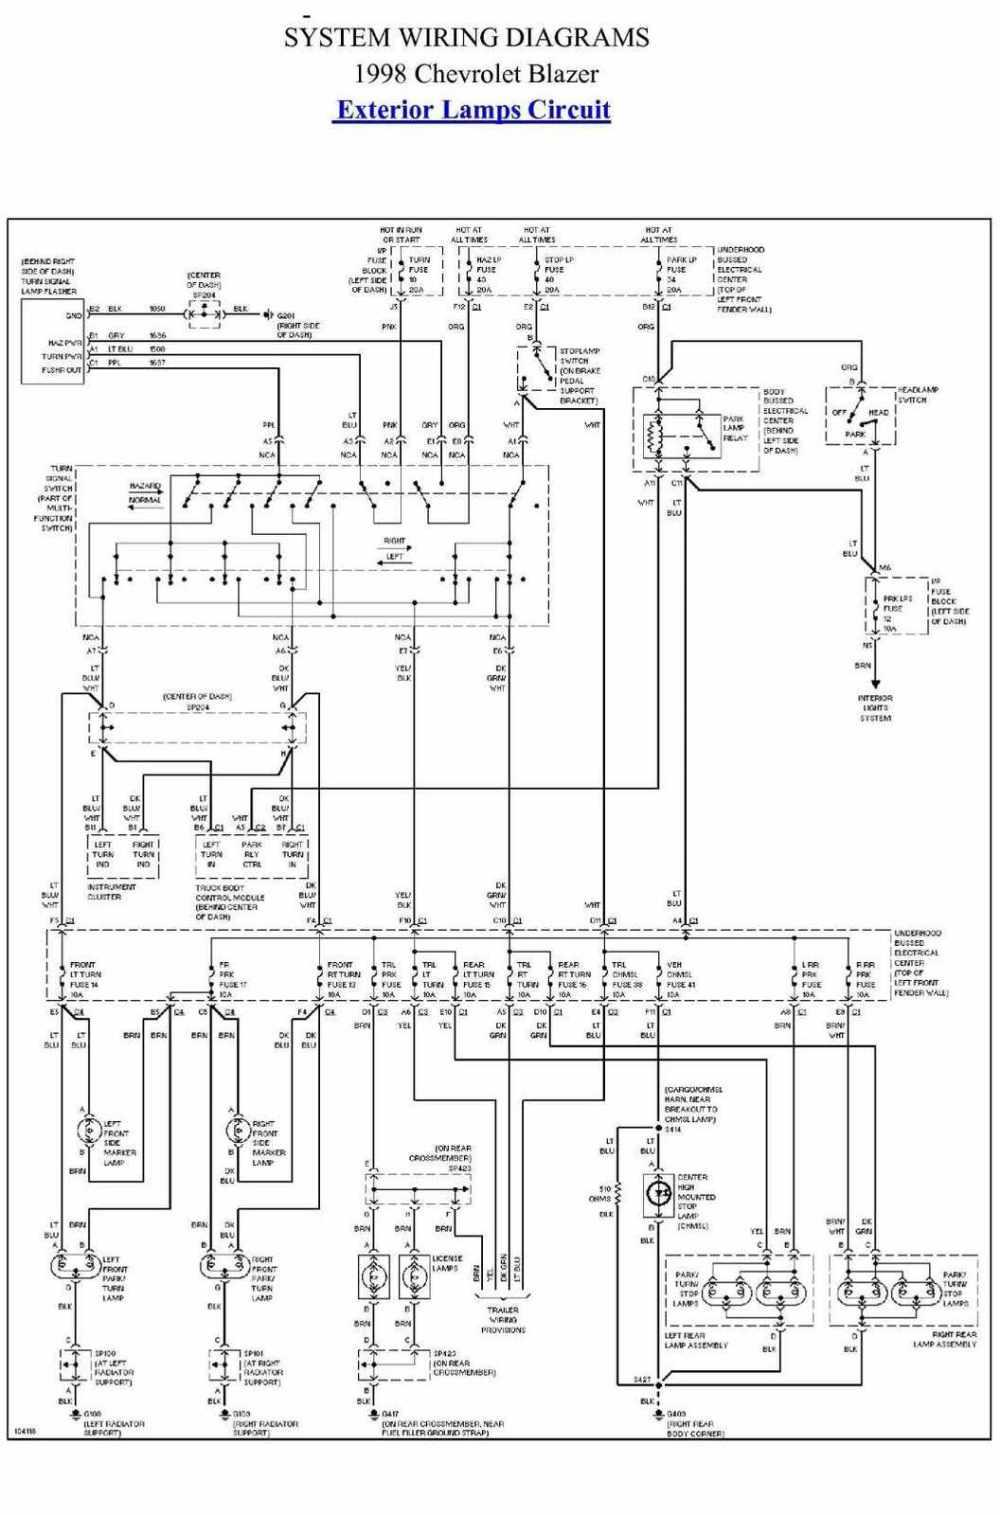 medium resolution of 98 eclipse wiring diagram wiring diagram todays rh 4 15 7 1813weddingbarn com 99 eclipse 96